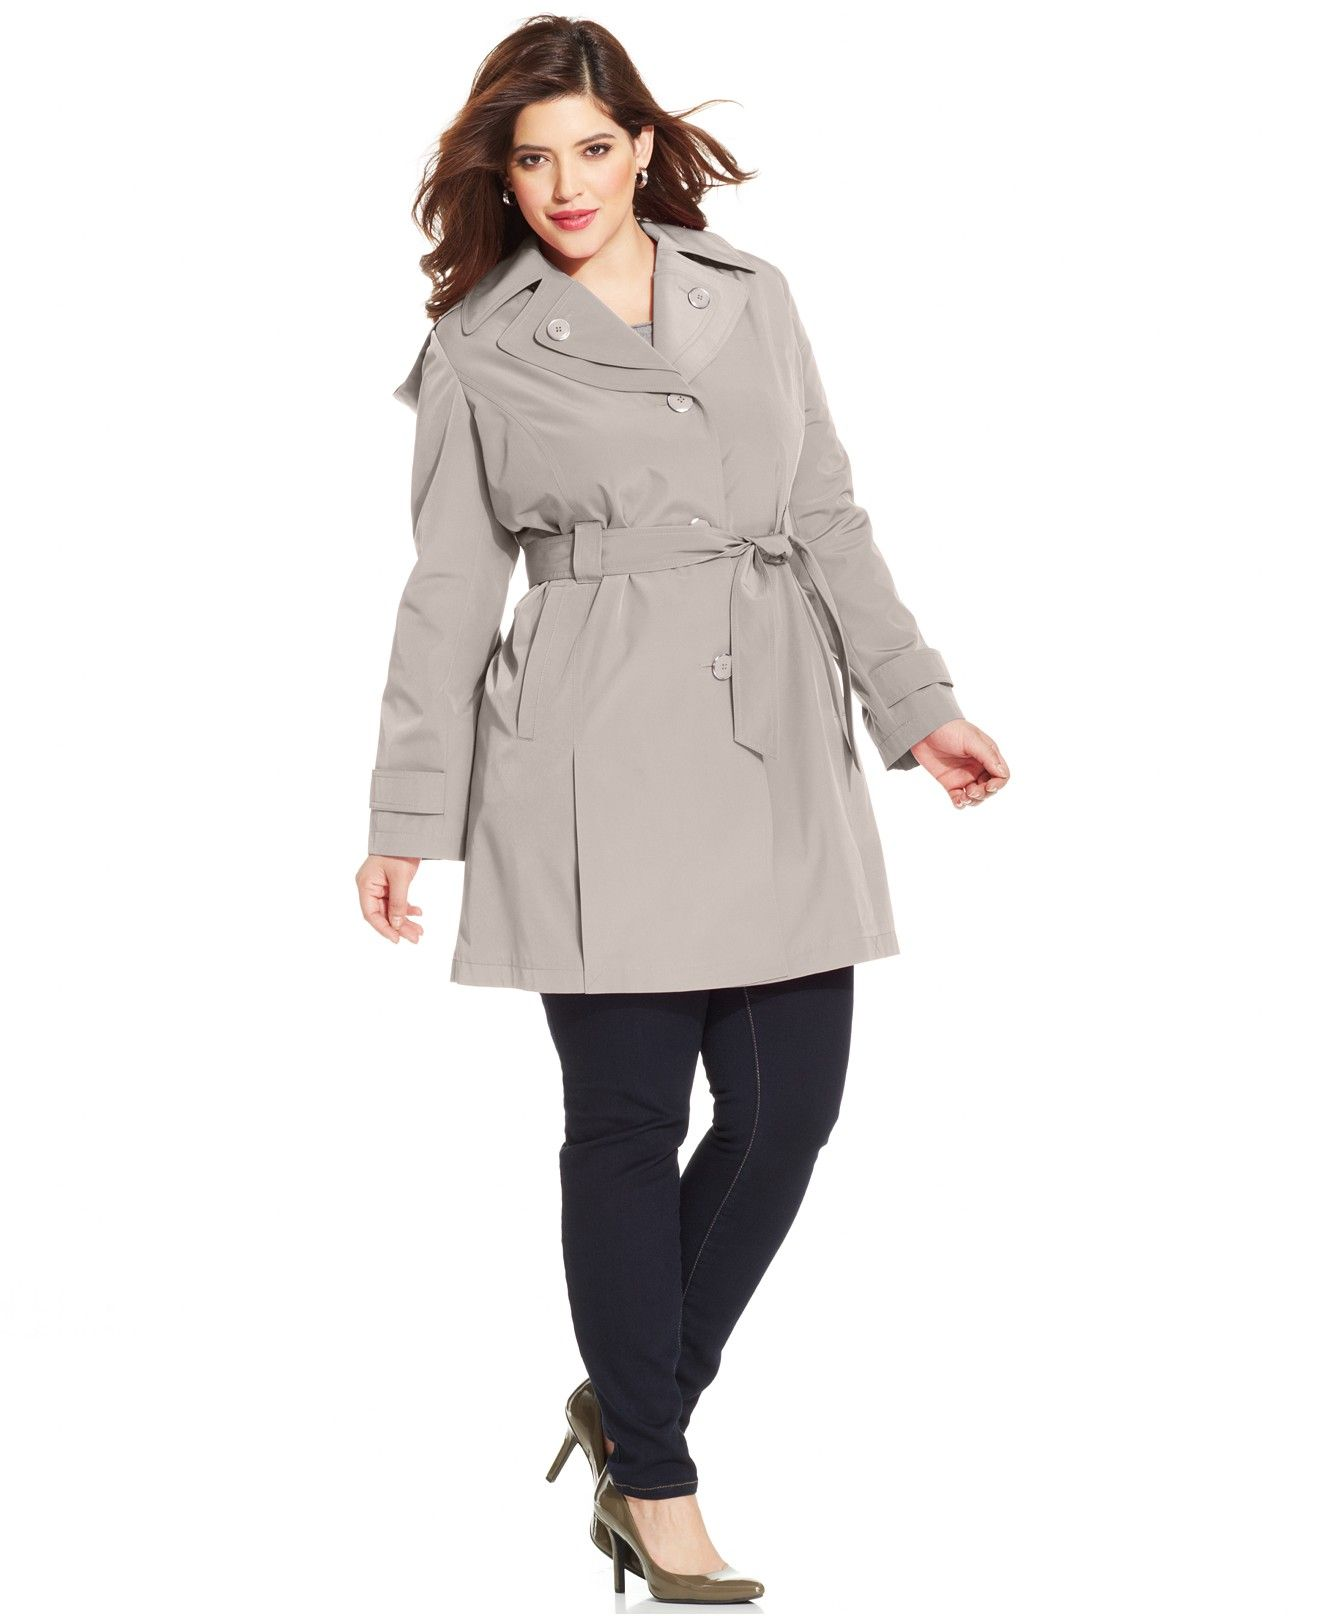 f09021b5ed5 London Fog Plus Size Hooded Layered-Lapel Trench Coat - Coats - Plus Sizes  - Macy s